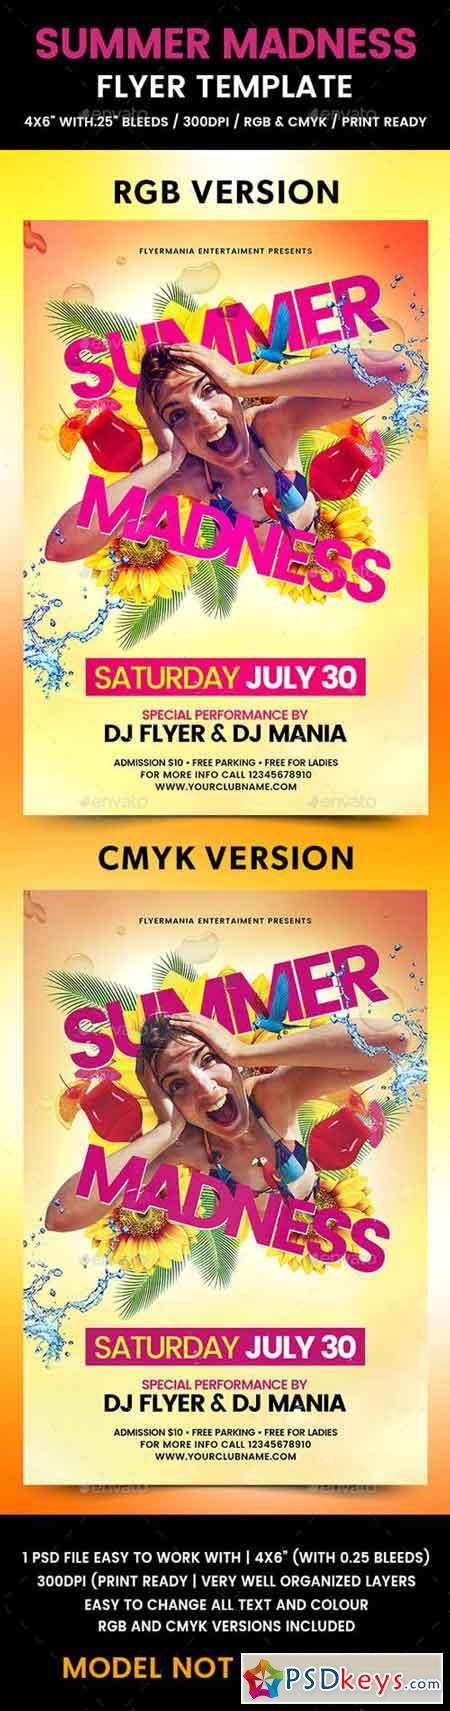 Summer Madness Flyer Template 19763840